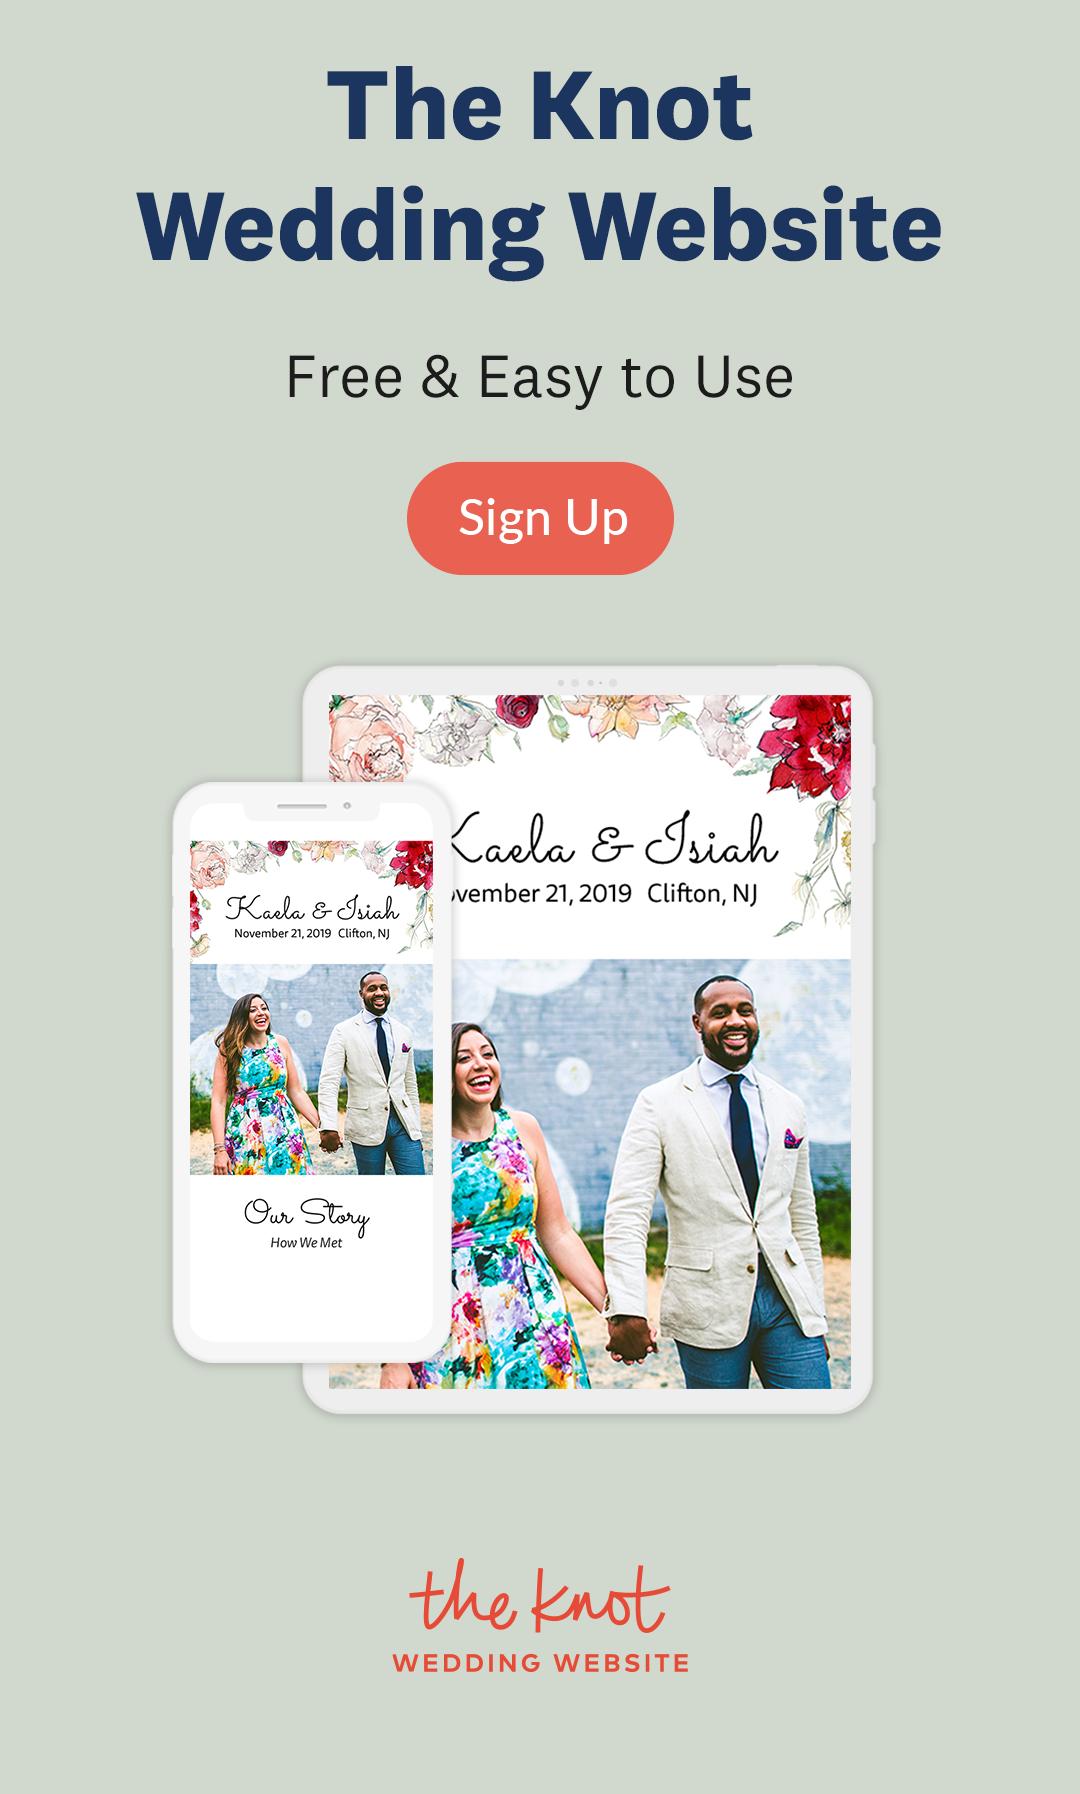 Free Wedding Website Wedding website free, Wedding